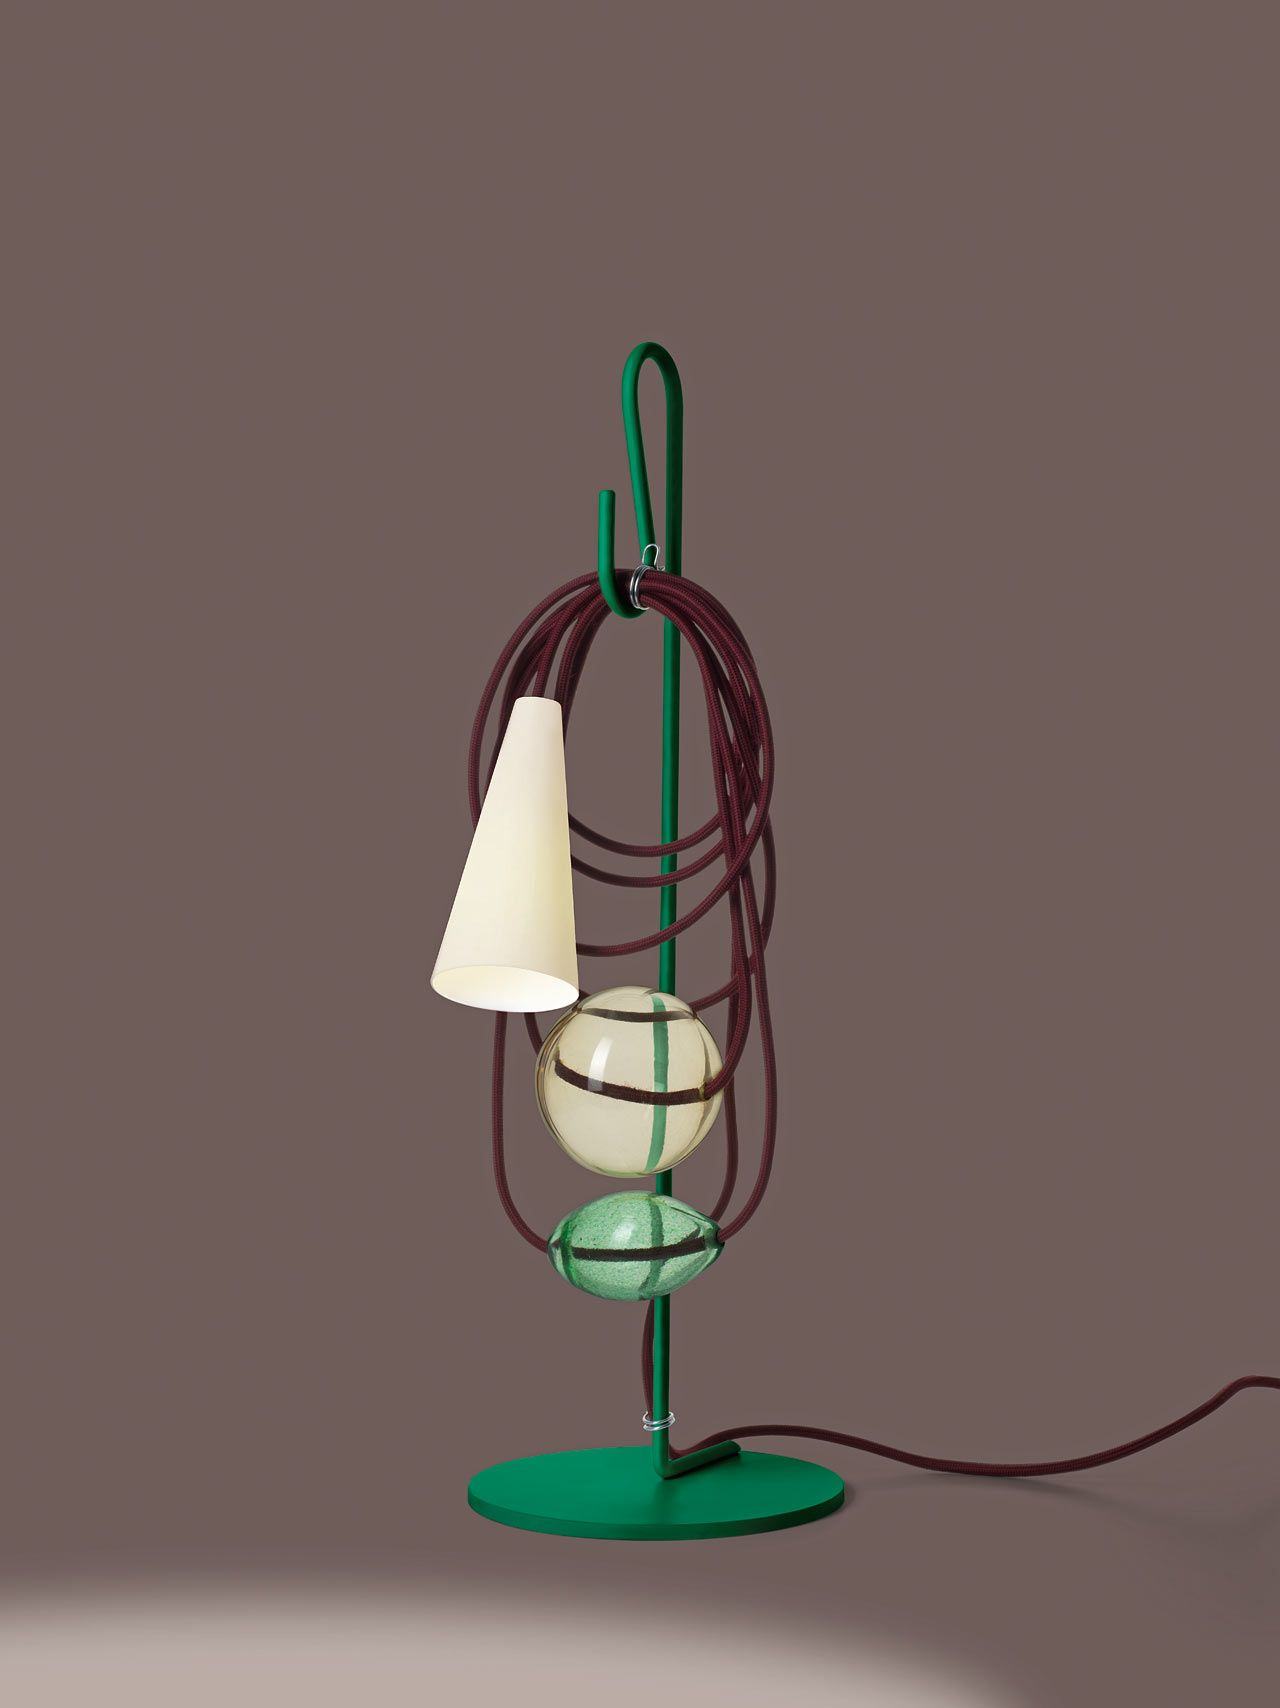 Foscarini Filo Lamp Andrea Anastasio 4 Filo_talisman Lights  # Muebles Neoline